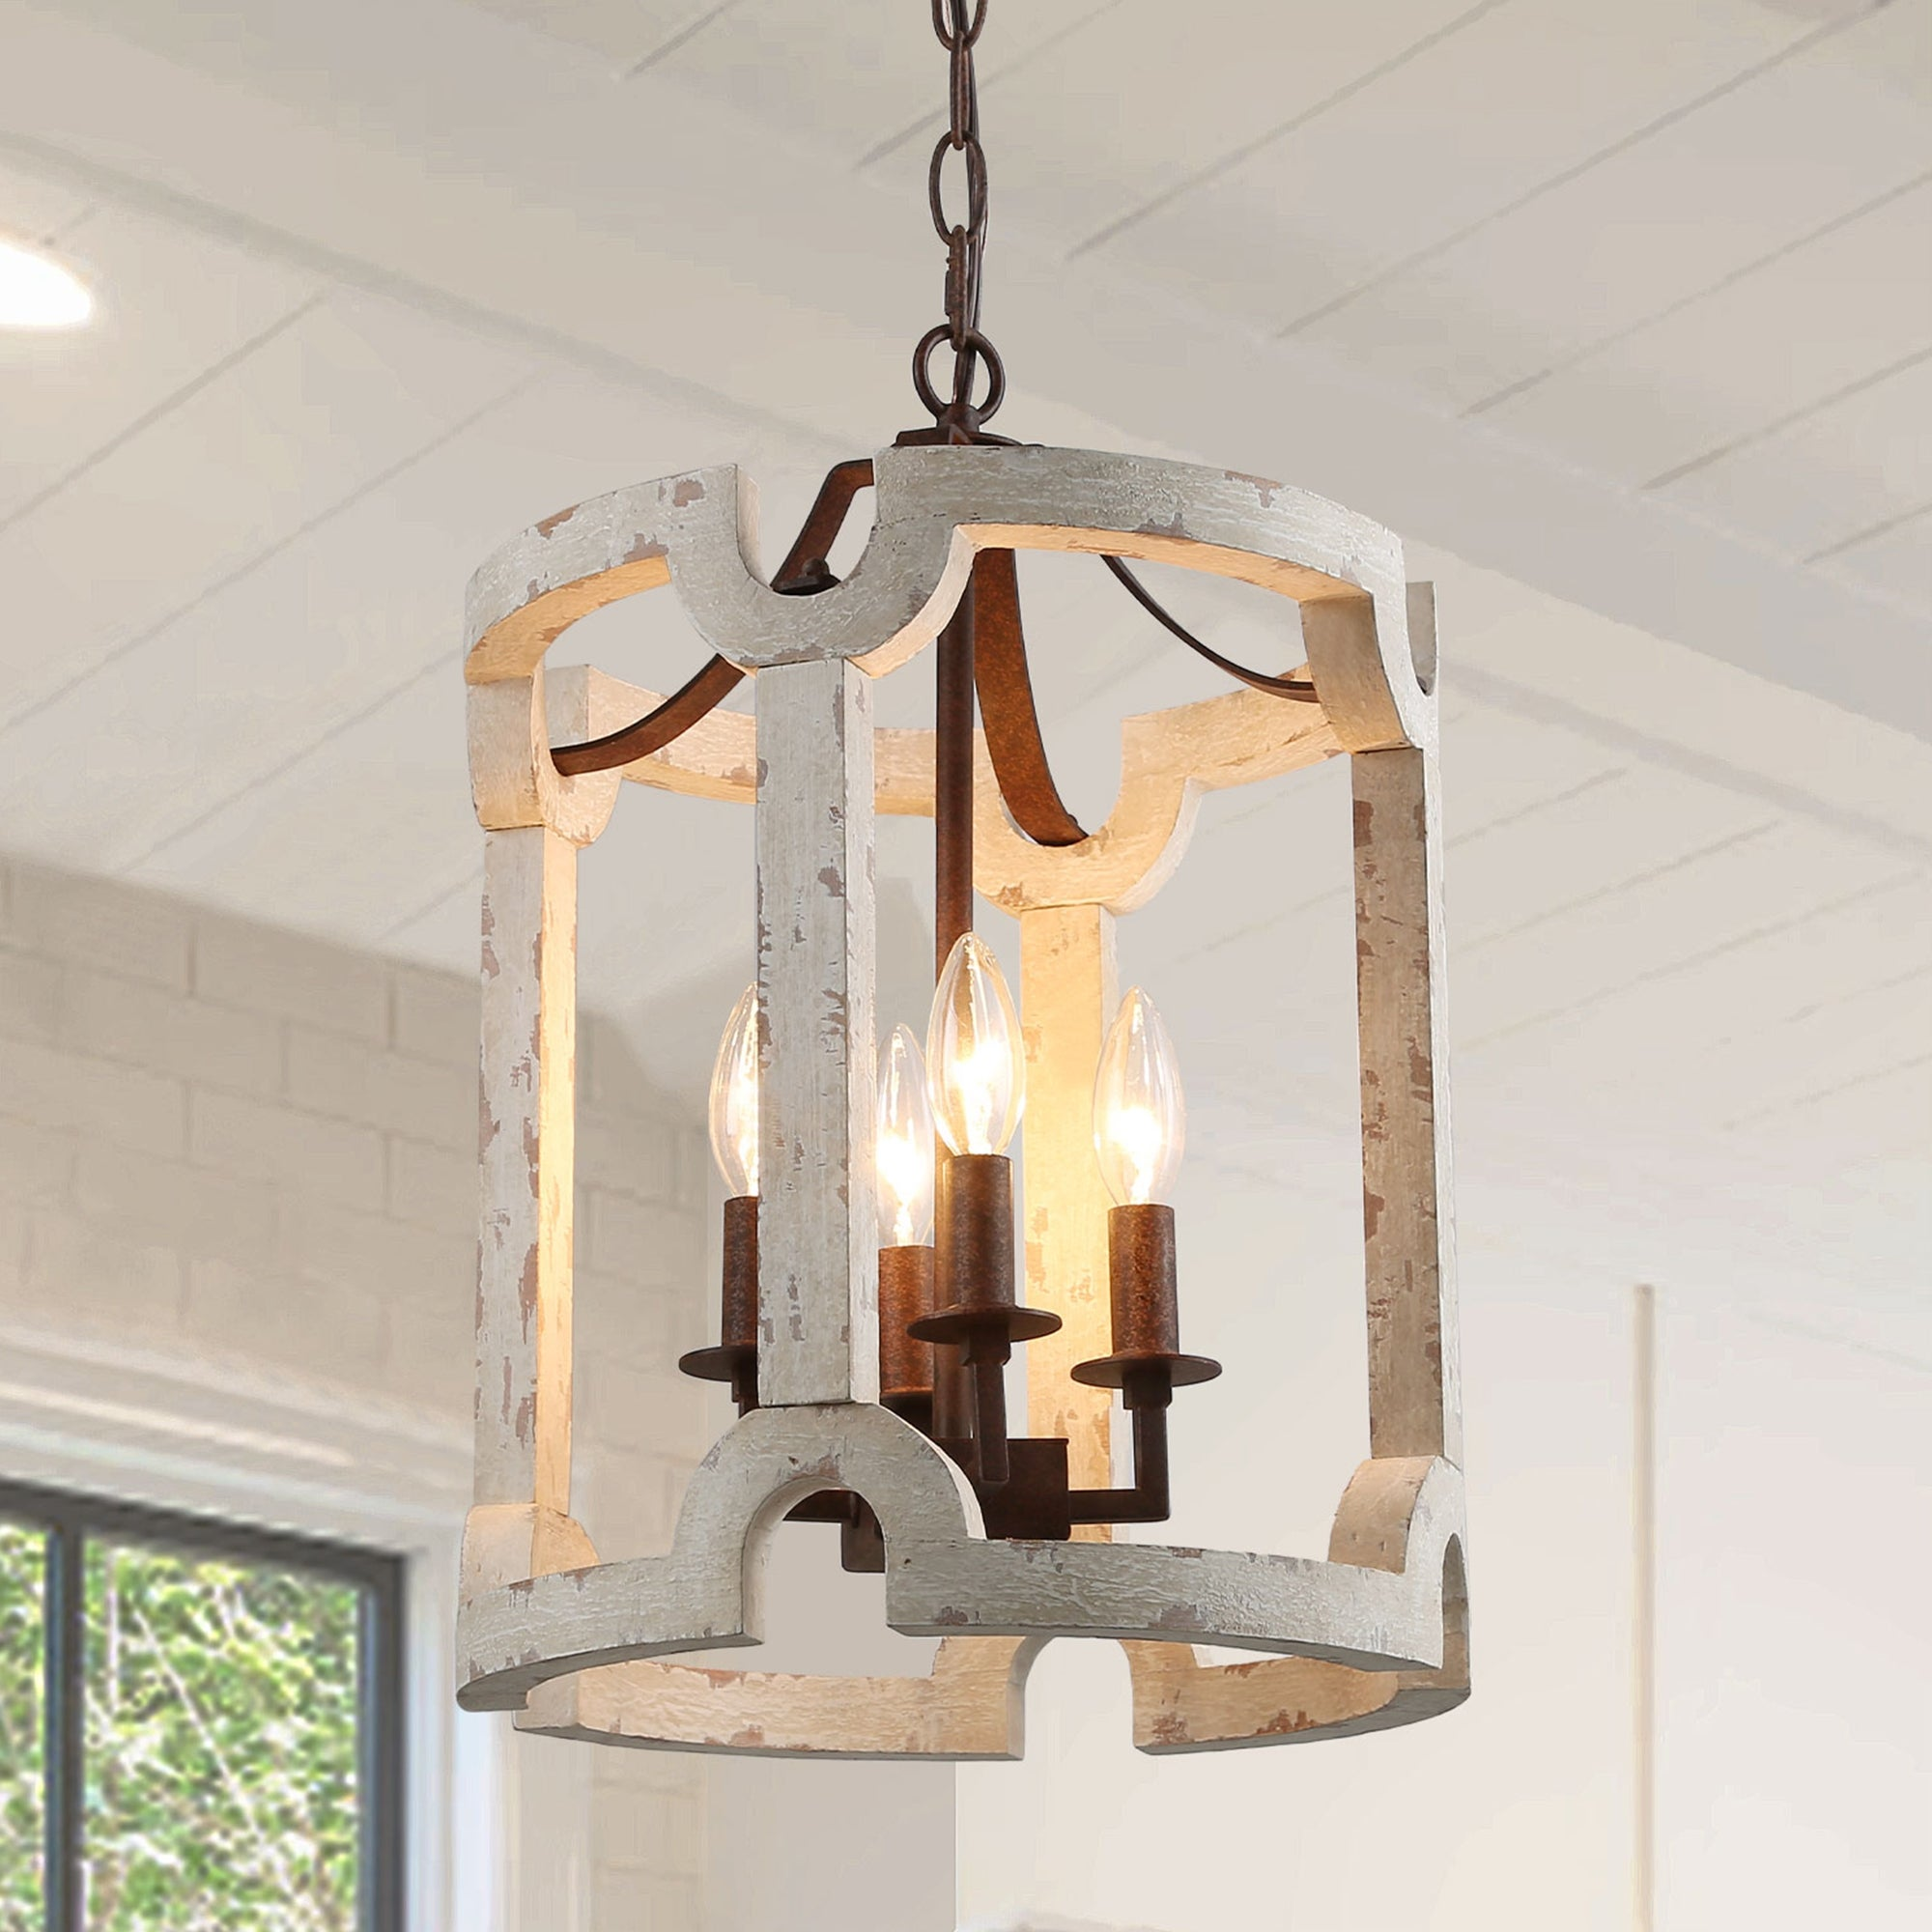 Chandeliers Farmhouse Pendant Lighting